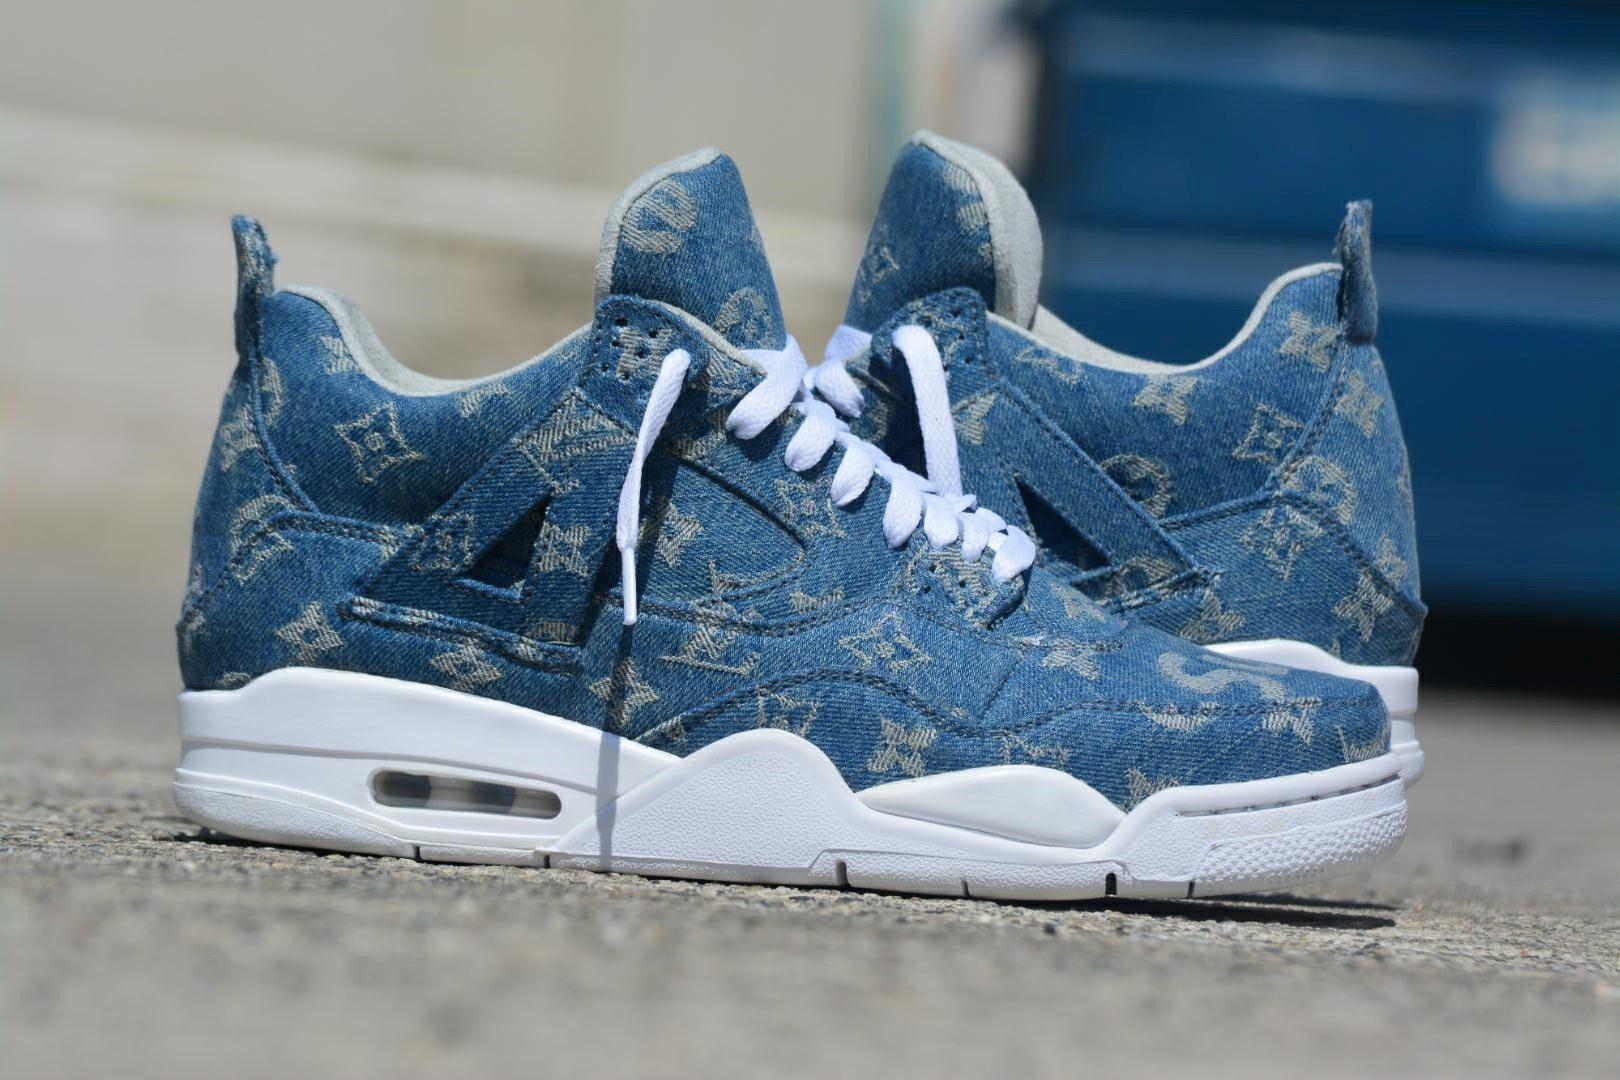 Nike LV Supreme Denim Jordan 4 Custom